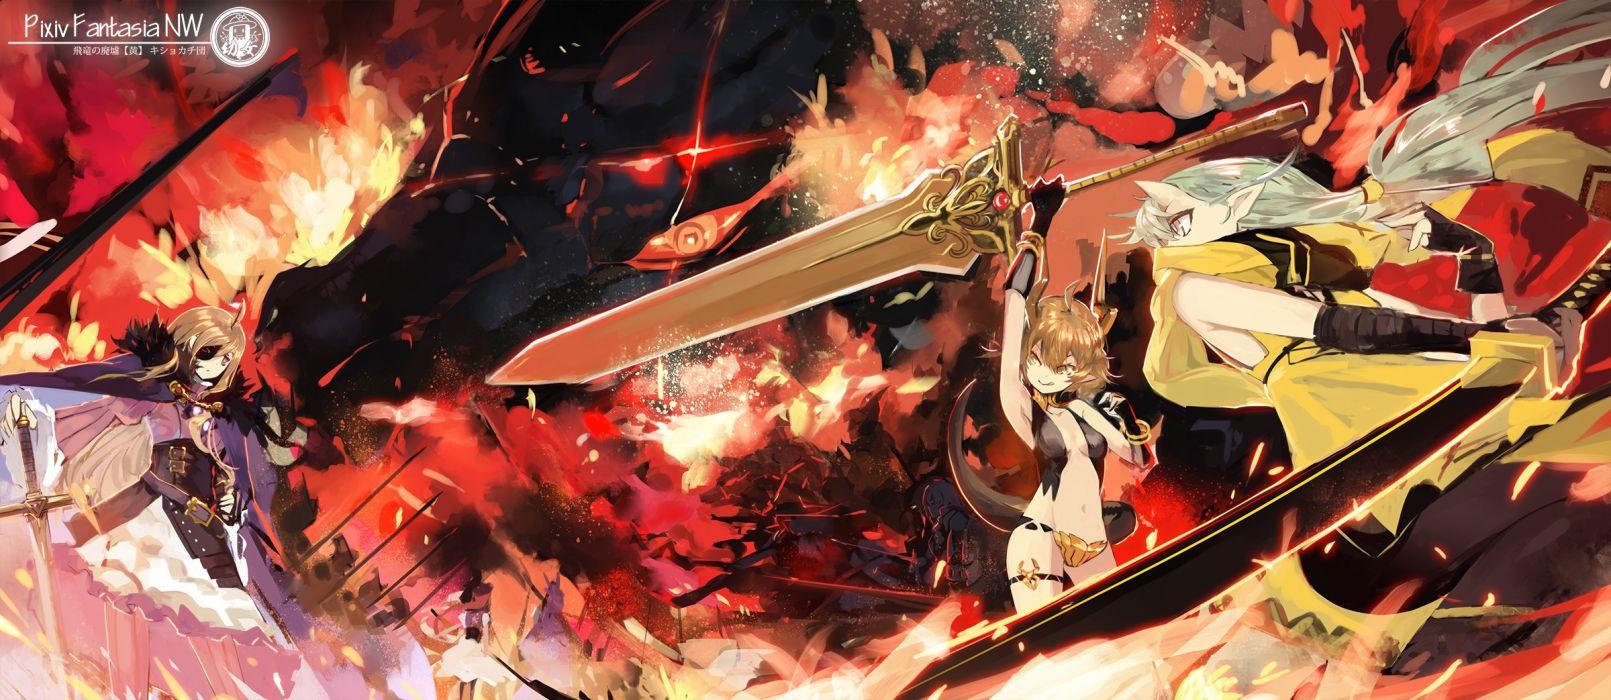 animal ears dragon fire horns pixiv fantasia red eyes saberiii sword weapon wallpaper